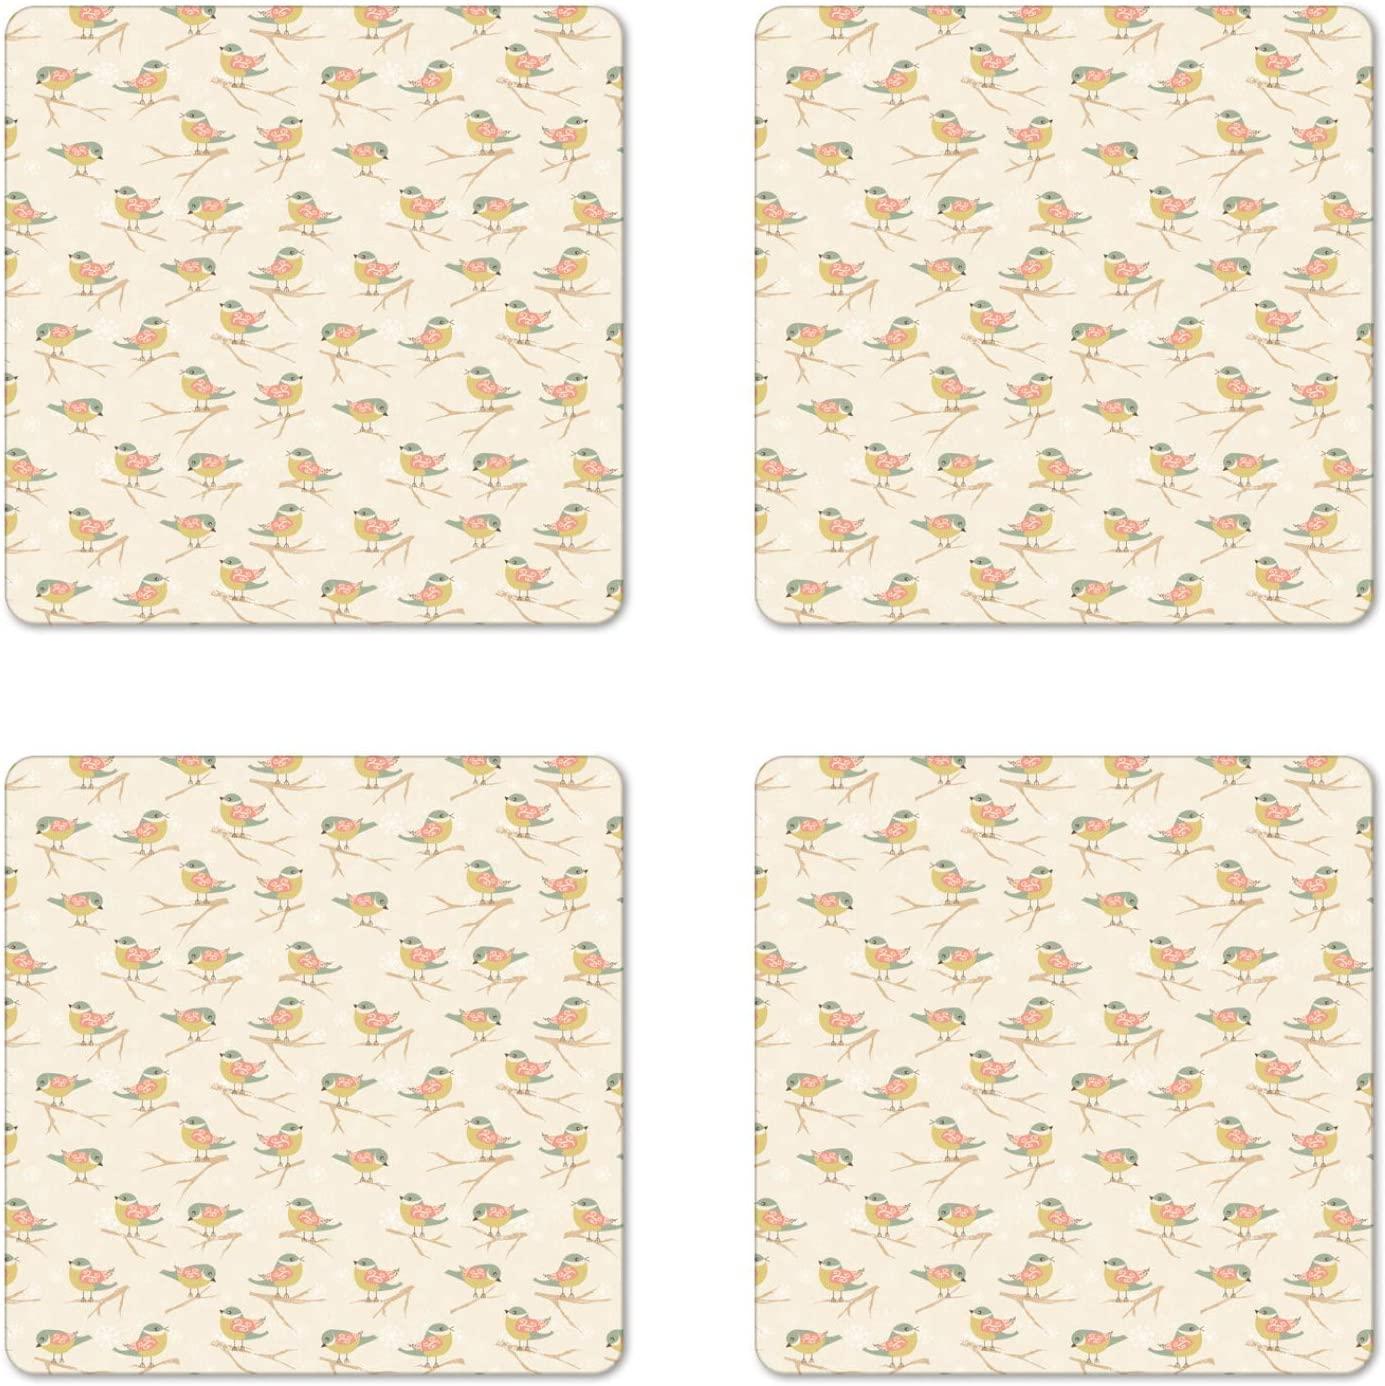 Lunarable Birds Coaster Set of 4, Rhythmic Fly Animals Snowflakes Curlicue Motifs Earth Tones Print, Square Hardboard Gloss Coasters, Standard Size, Eggshell Reseda Green